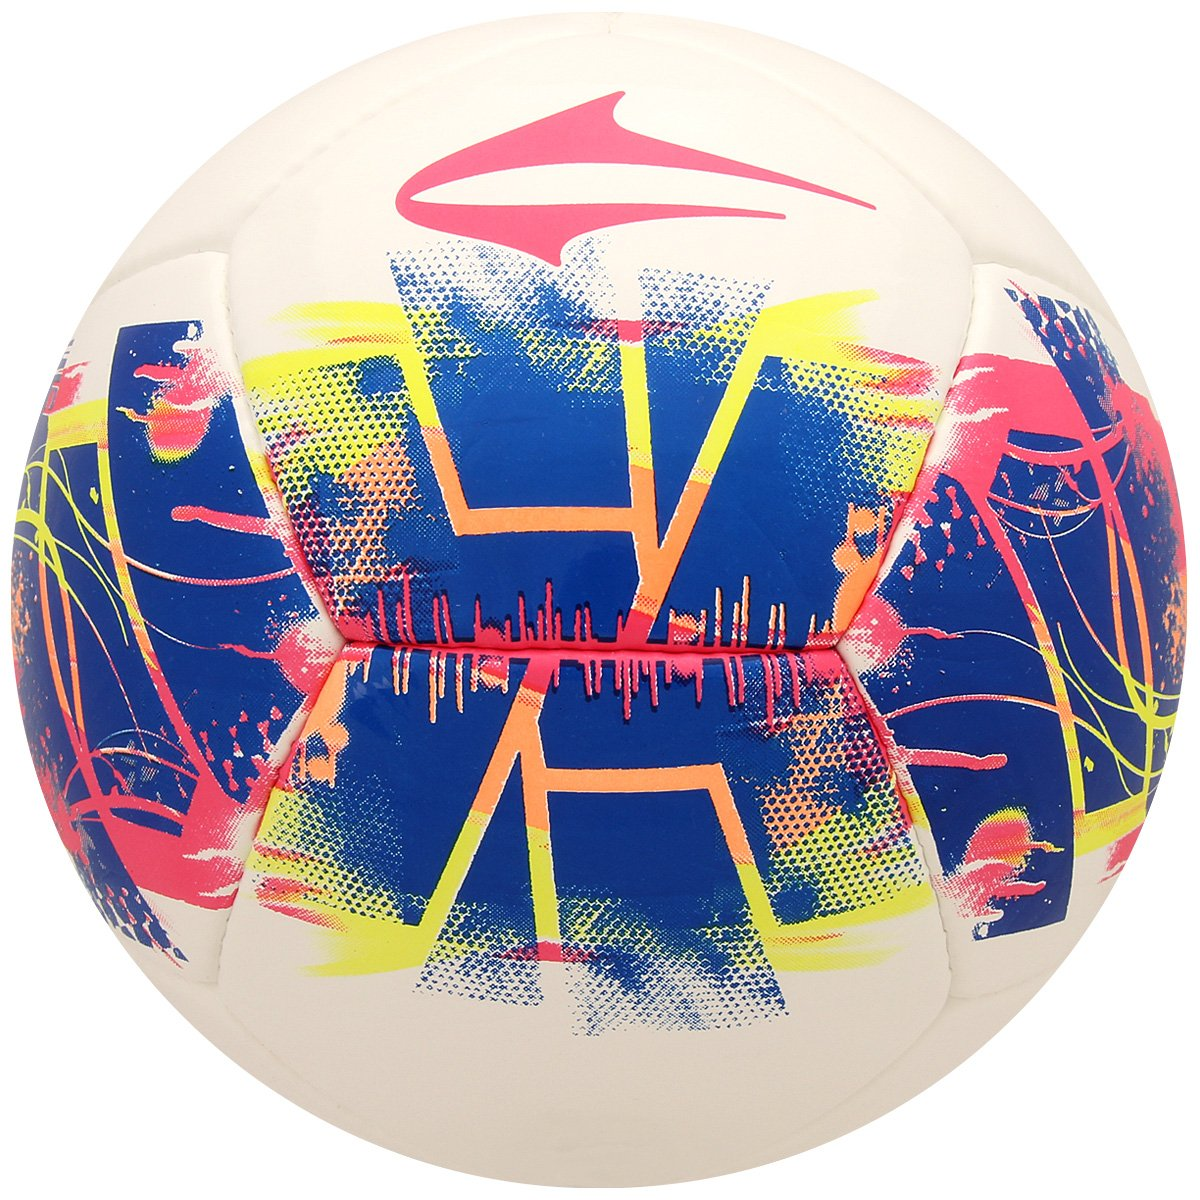 04b4b164f7 Bola Futebol Topper KV Réplica 2015 Futsal - Compre Agora